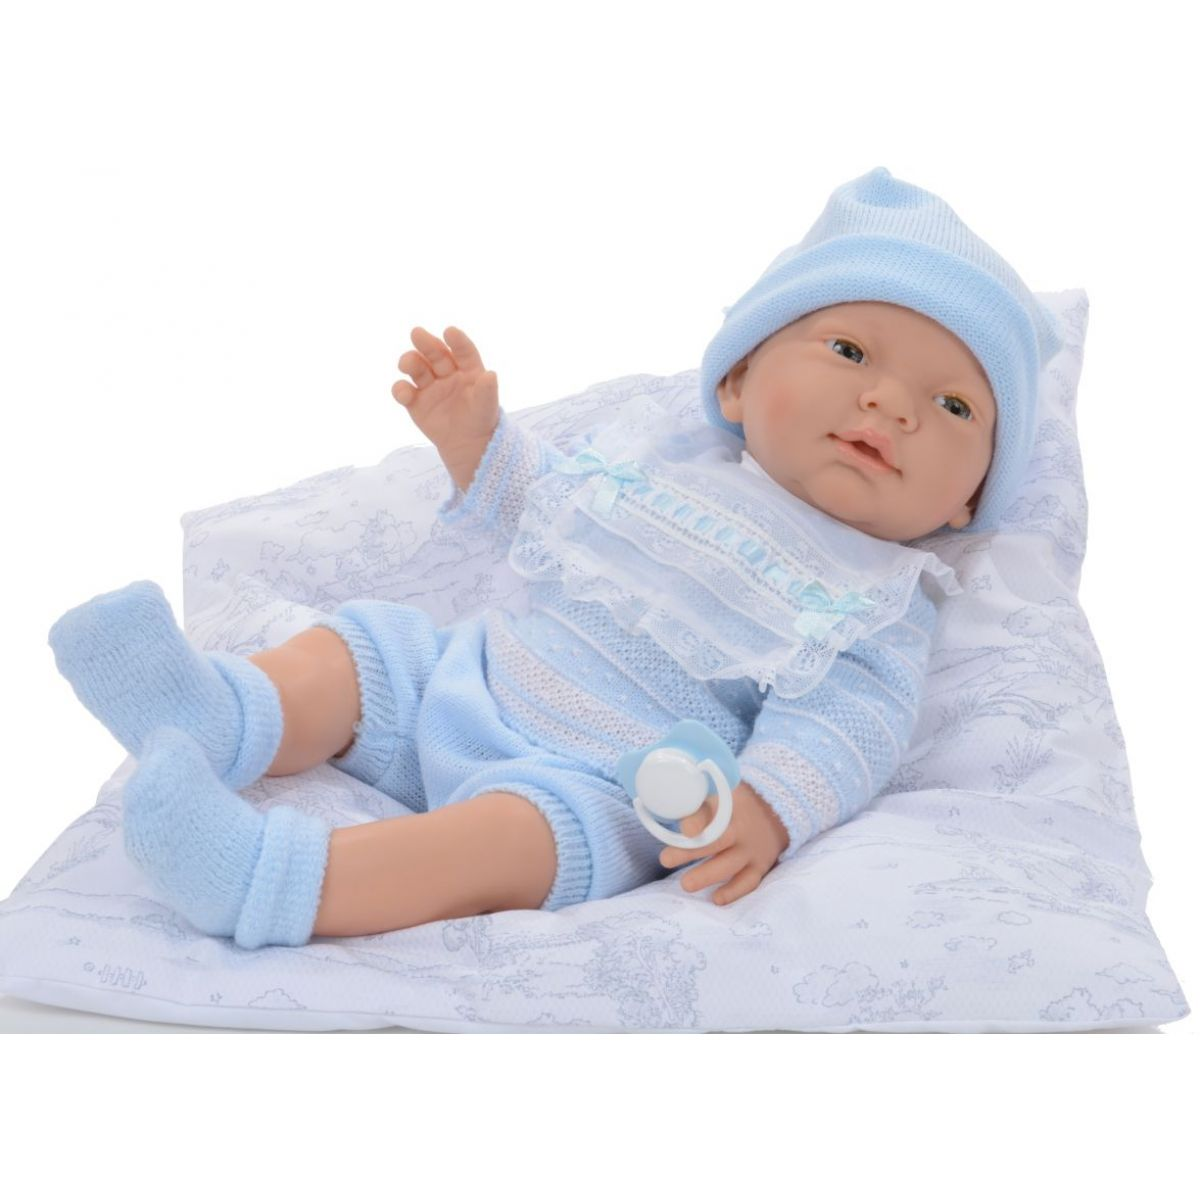 Nines panenka Novorozeně Plaváček 45 cm kluk